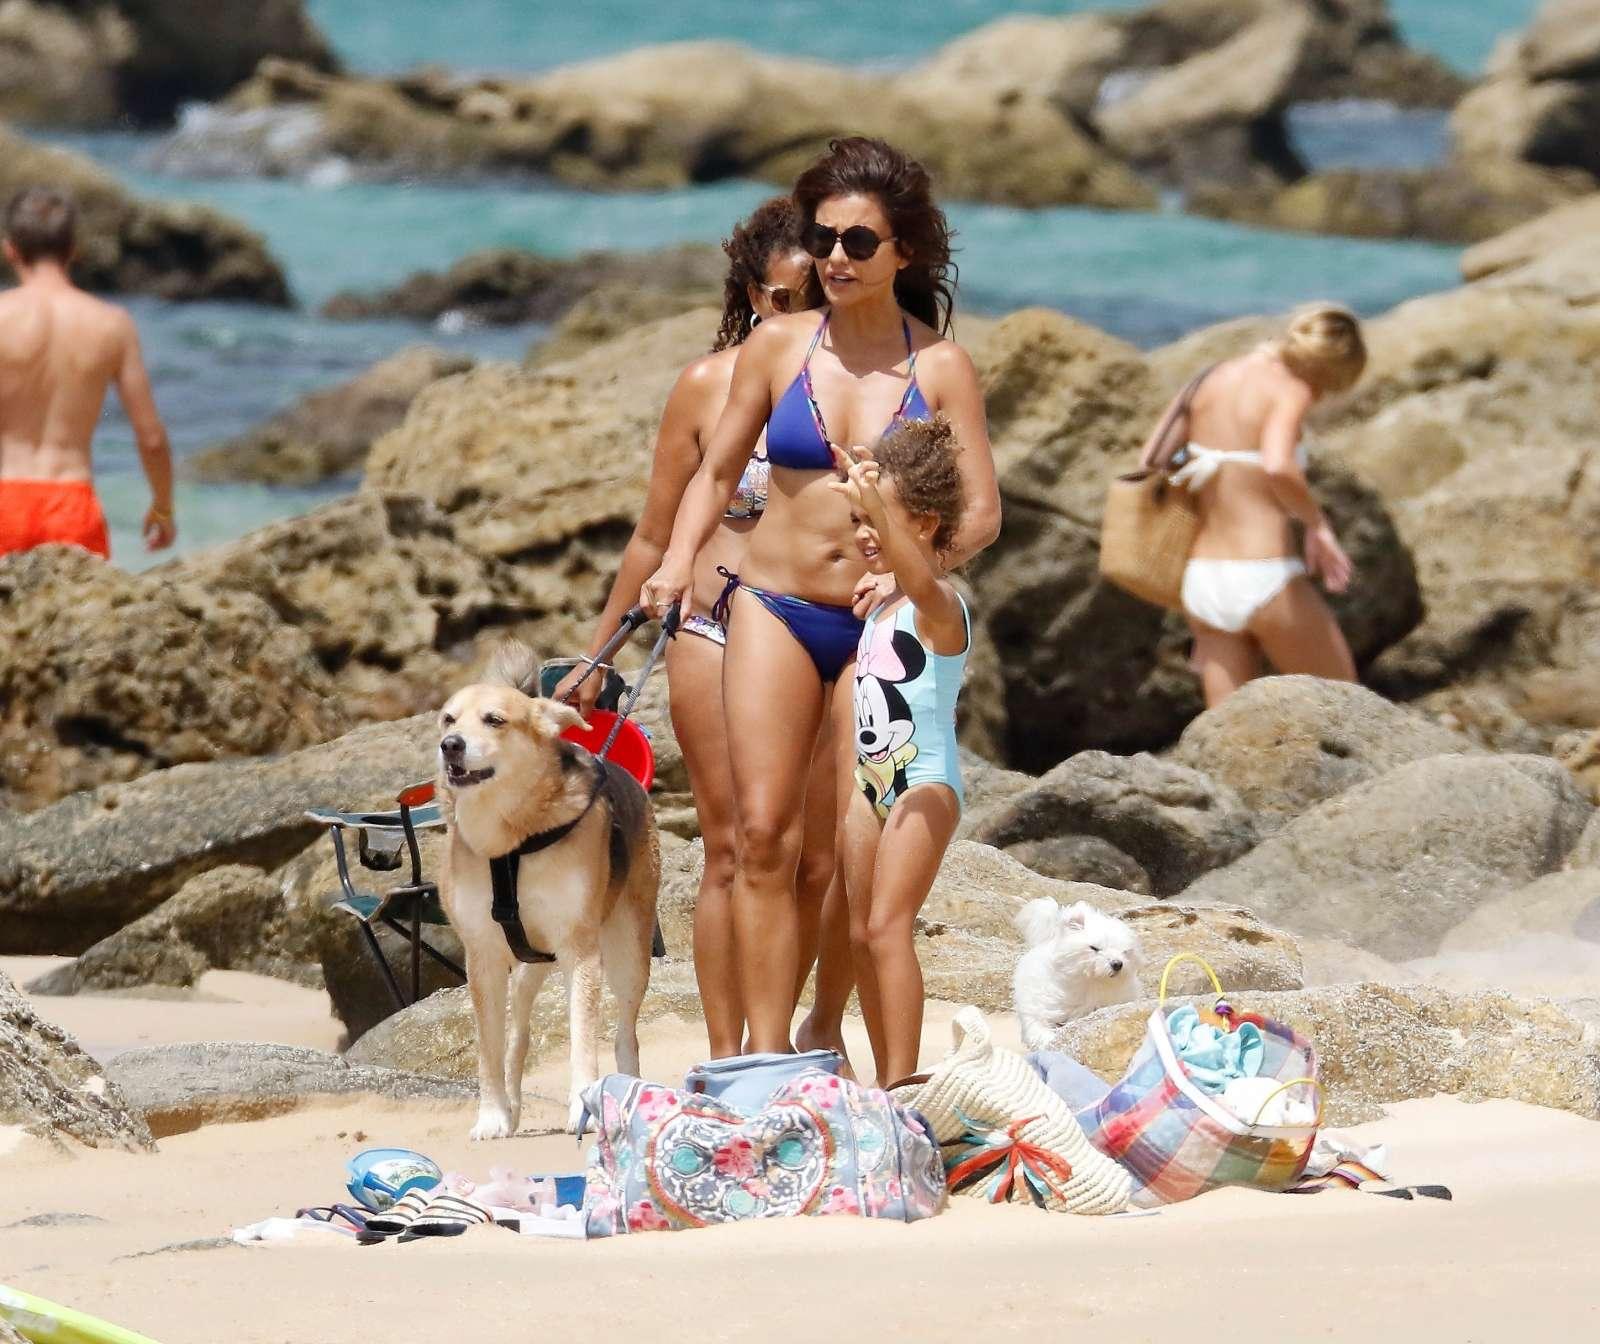 Monica Cruz 2017 : Monica Cruz in Bikini 2017 -10